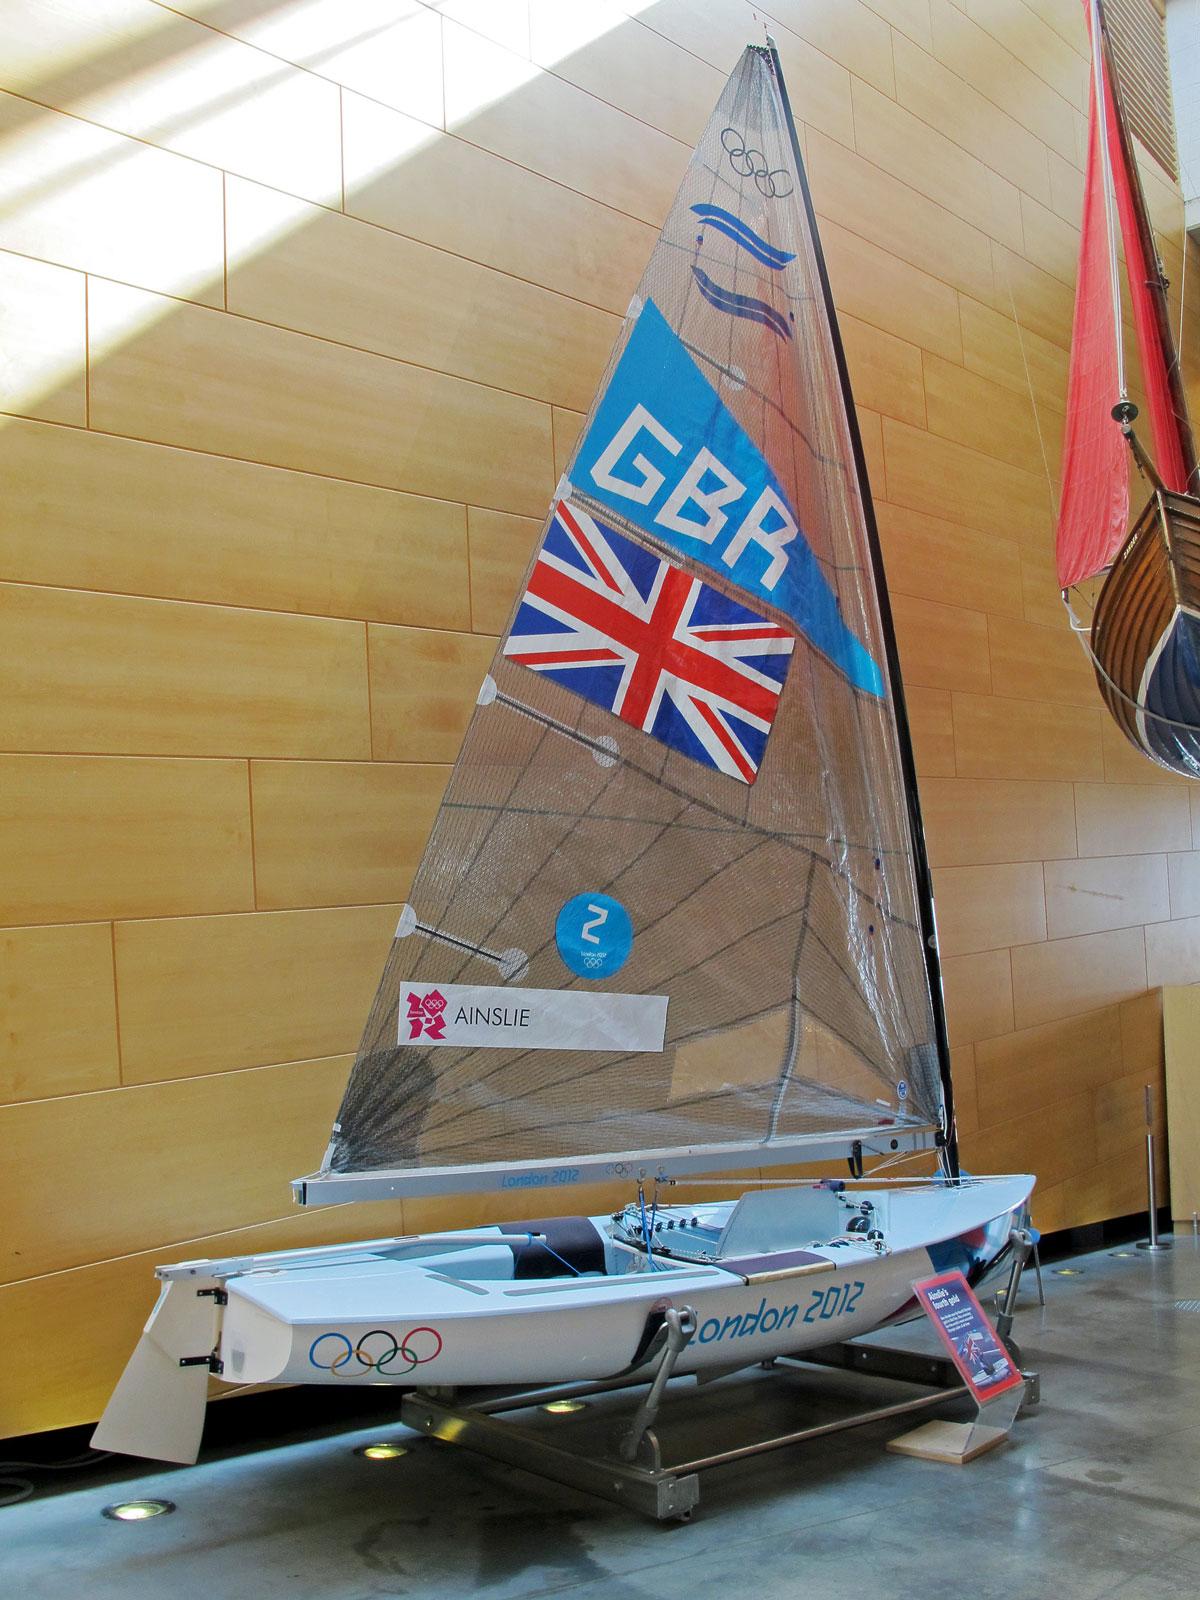 Ben Ainslie's Olympic Gold Medal winning boat